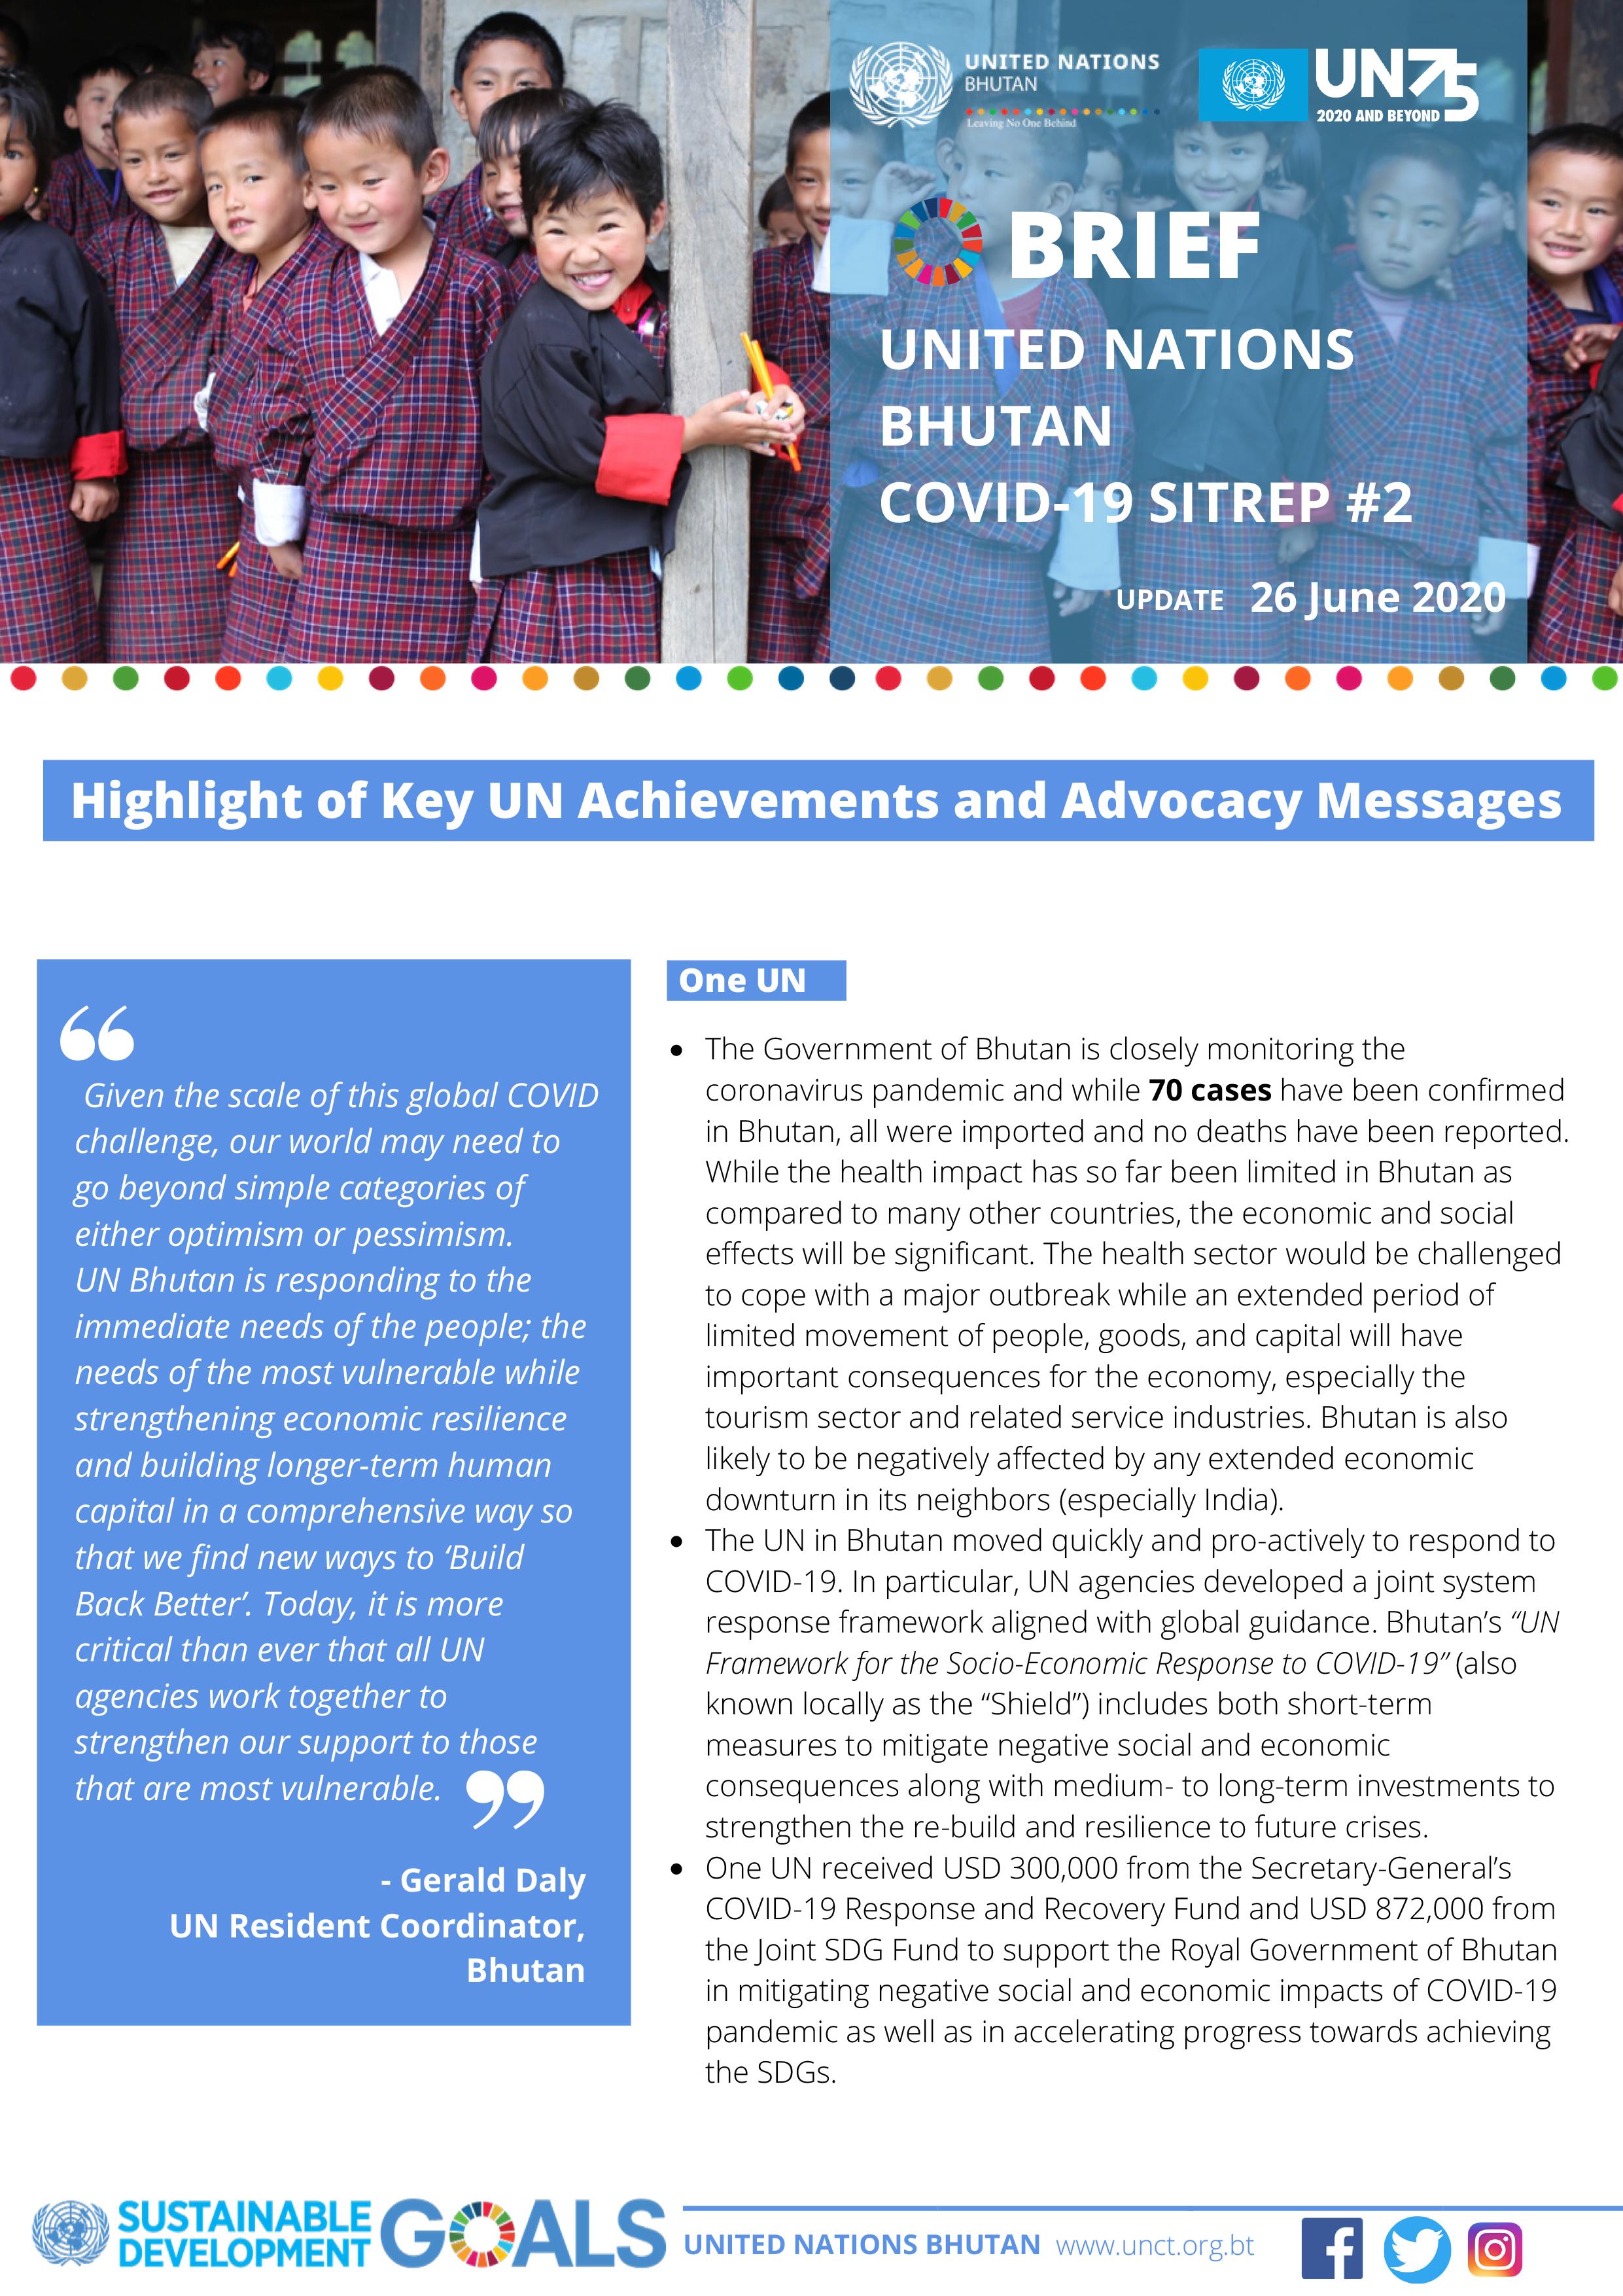 UN Bhutan COVID-19 Sitrep #2 – June